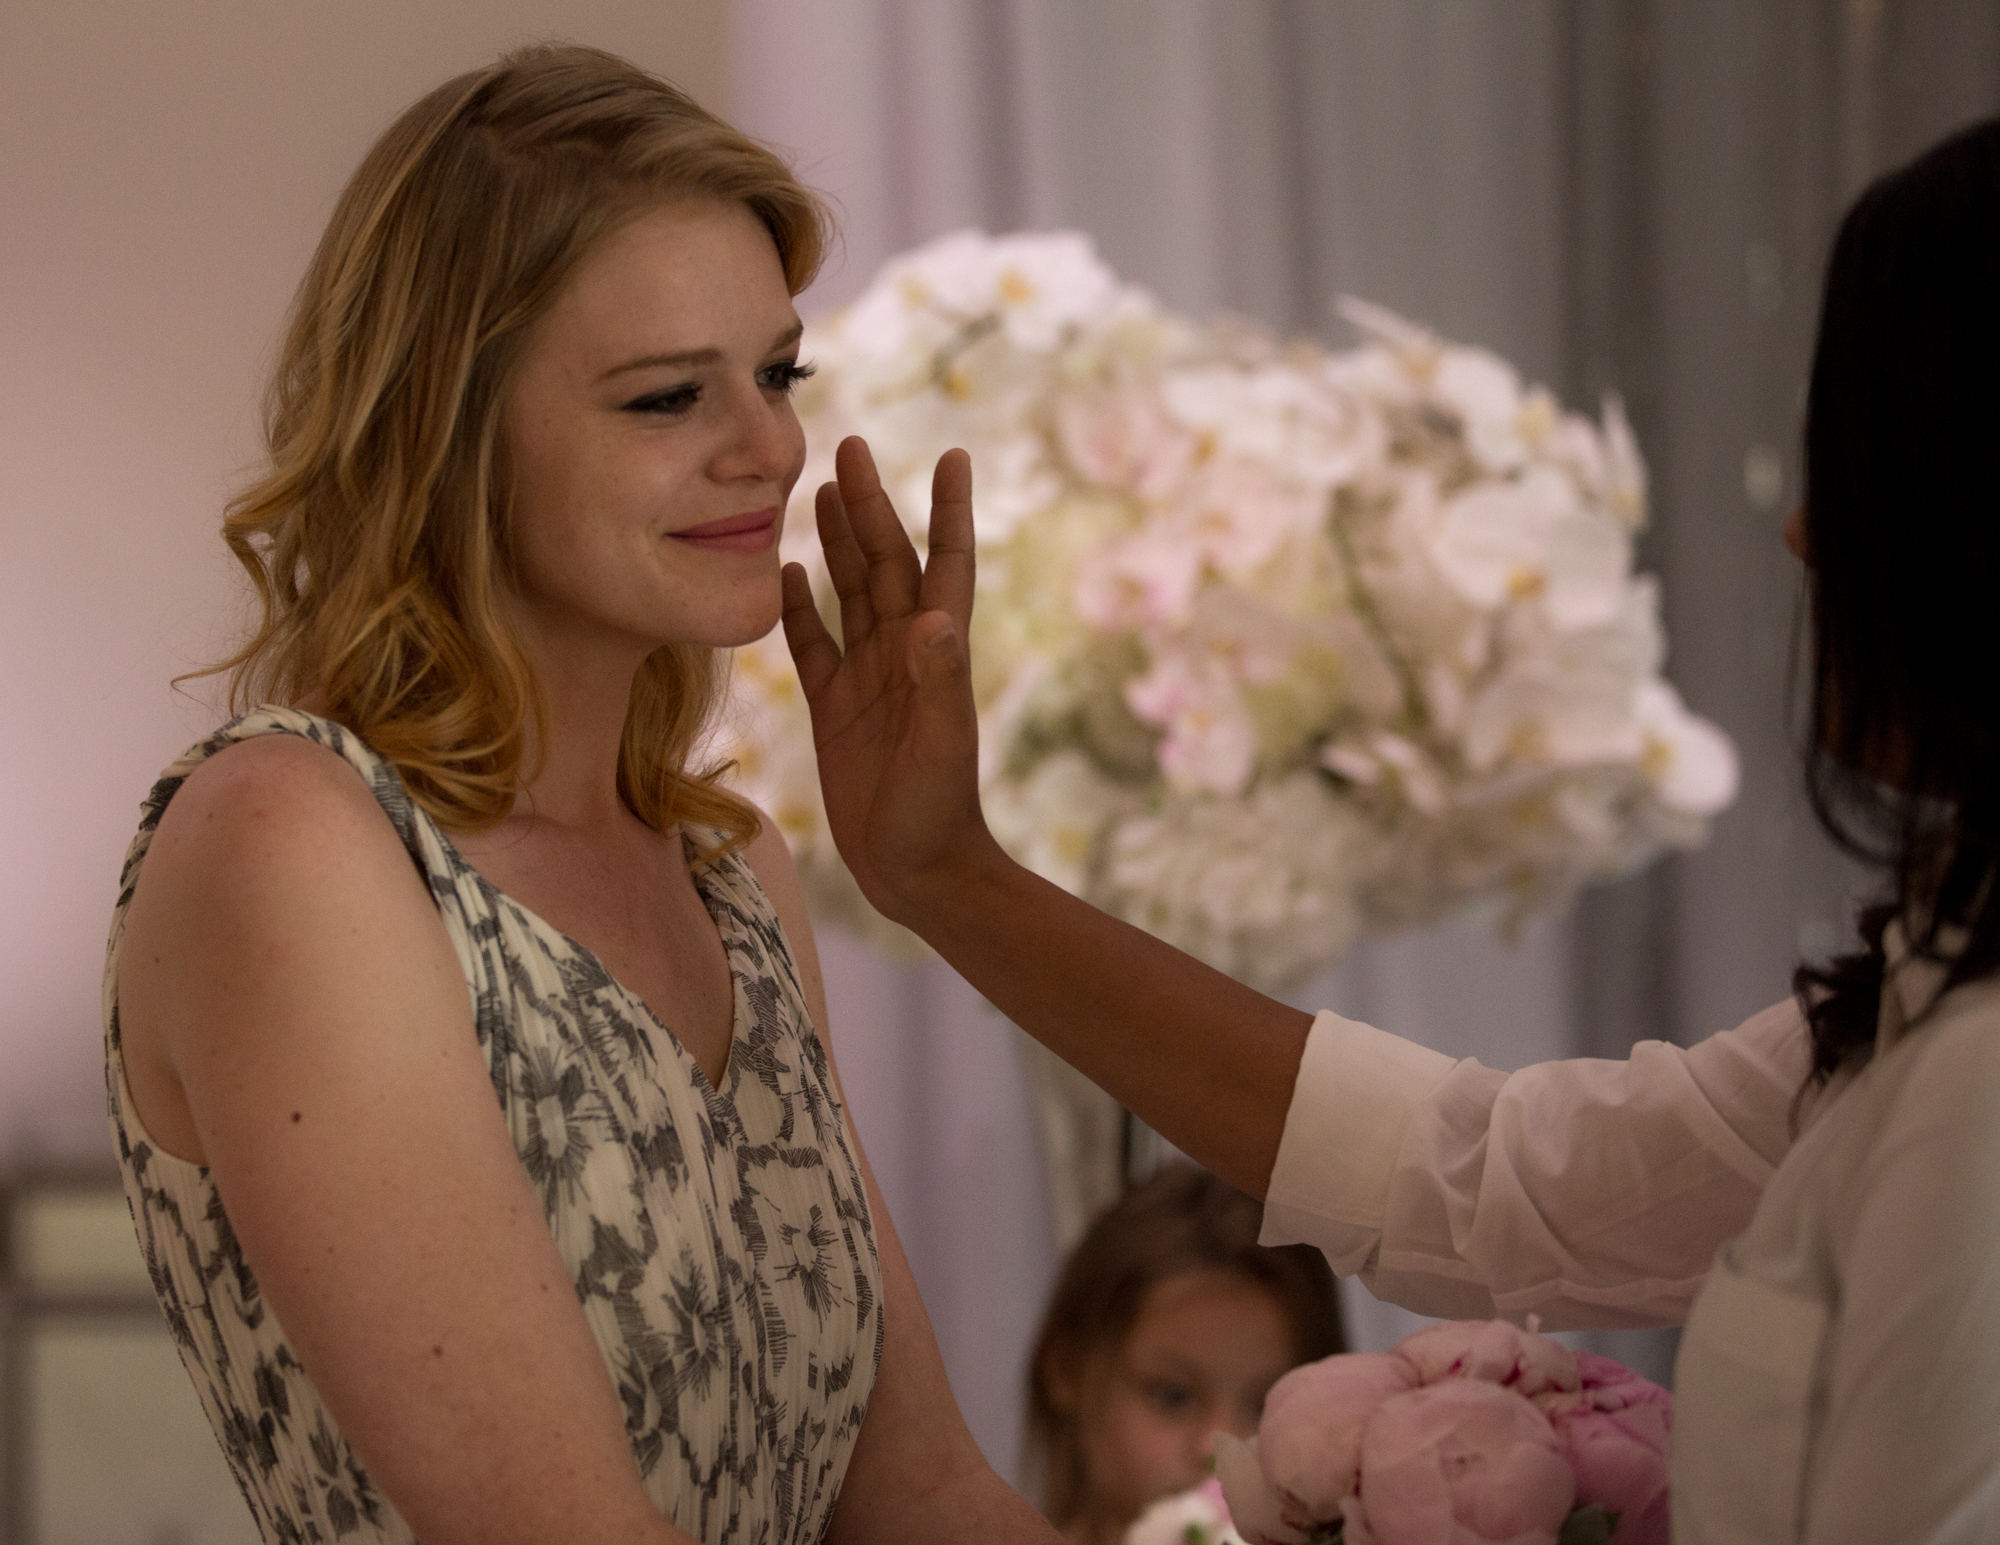 Colleen Stavrakos Wedding Photography bride reaching for fiancée's cheek